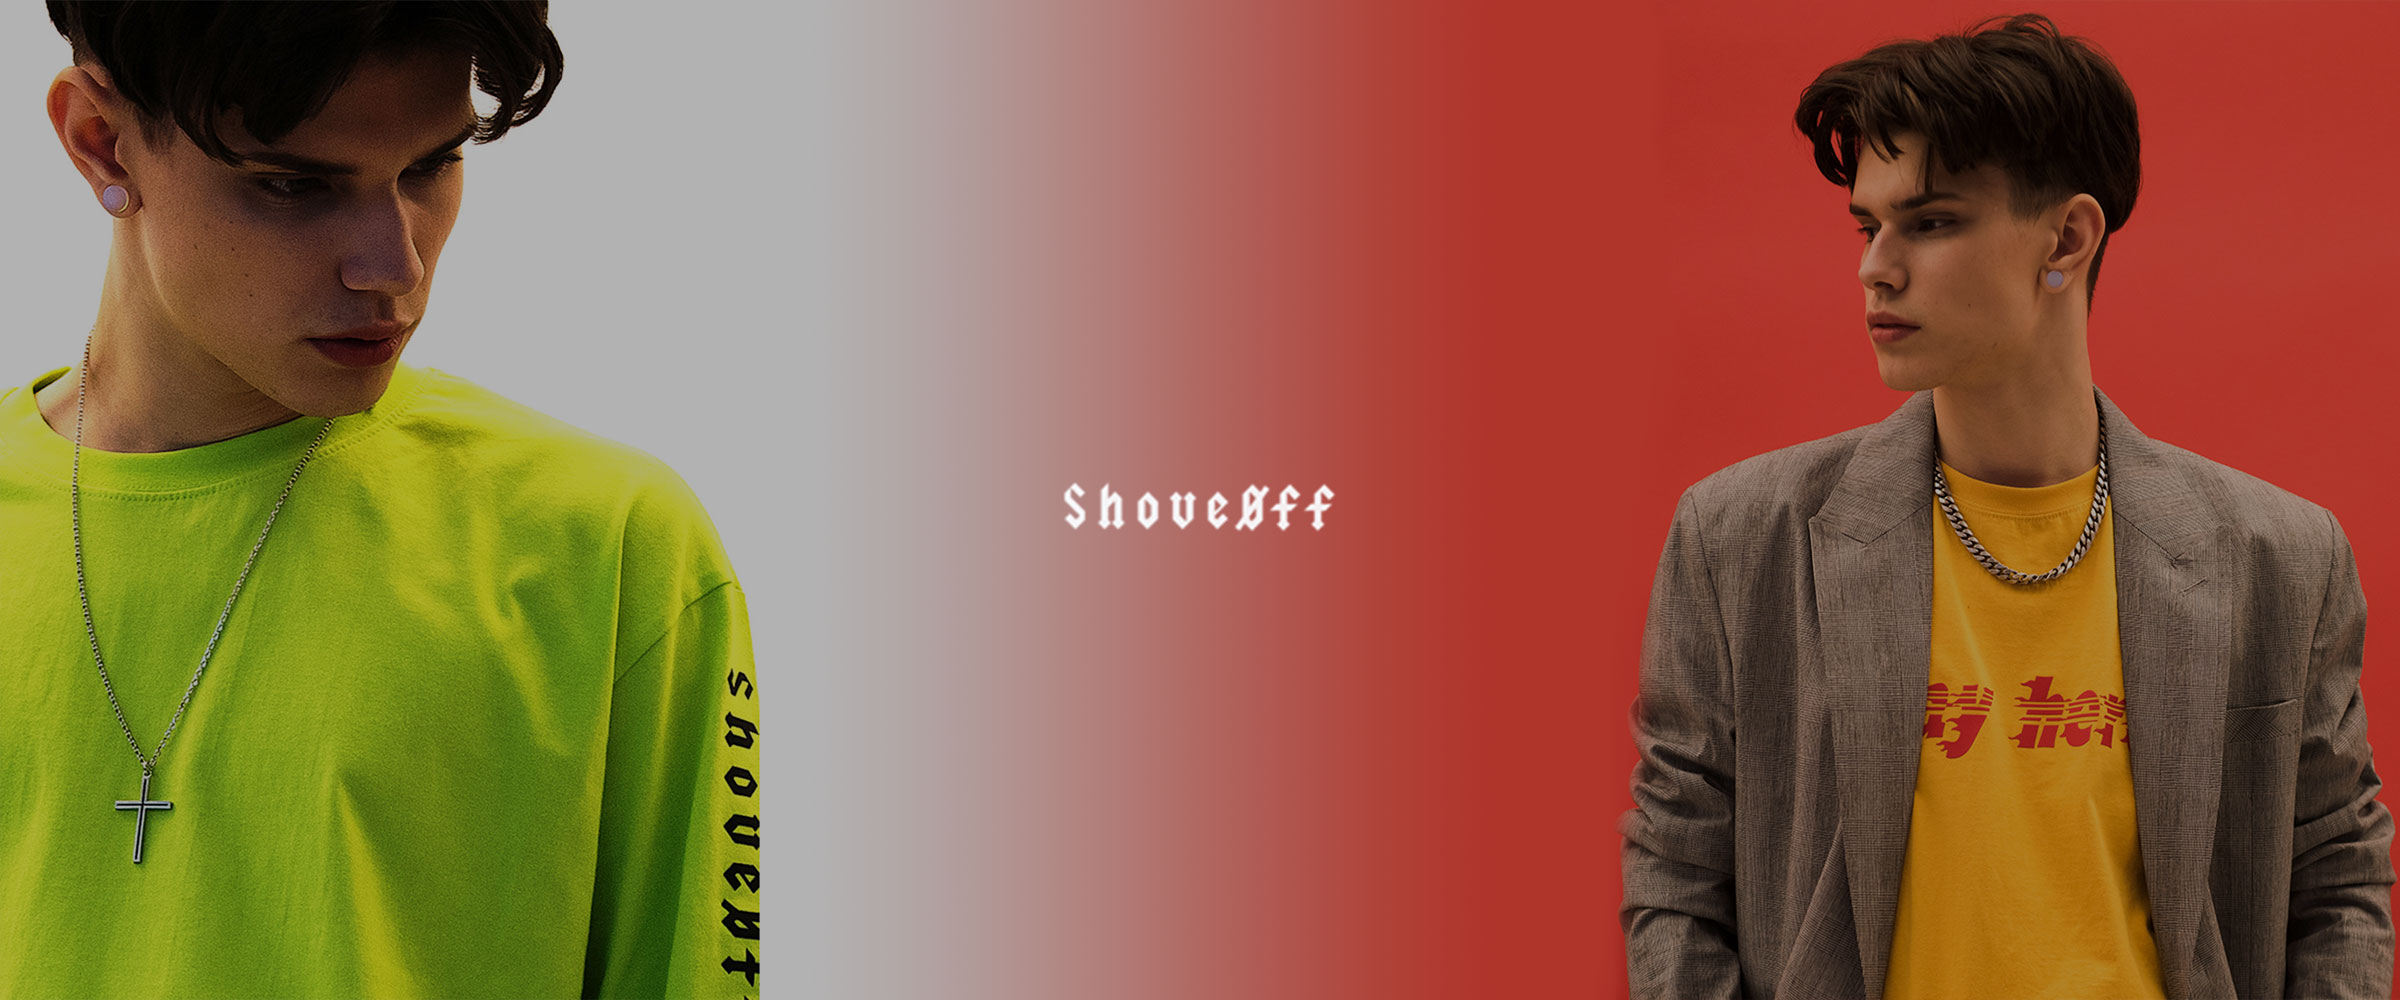 shoveoff.jpg